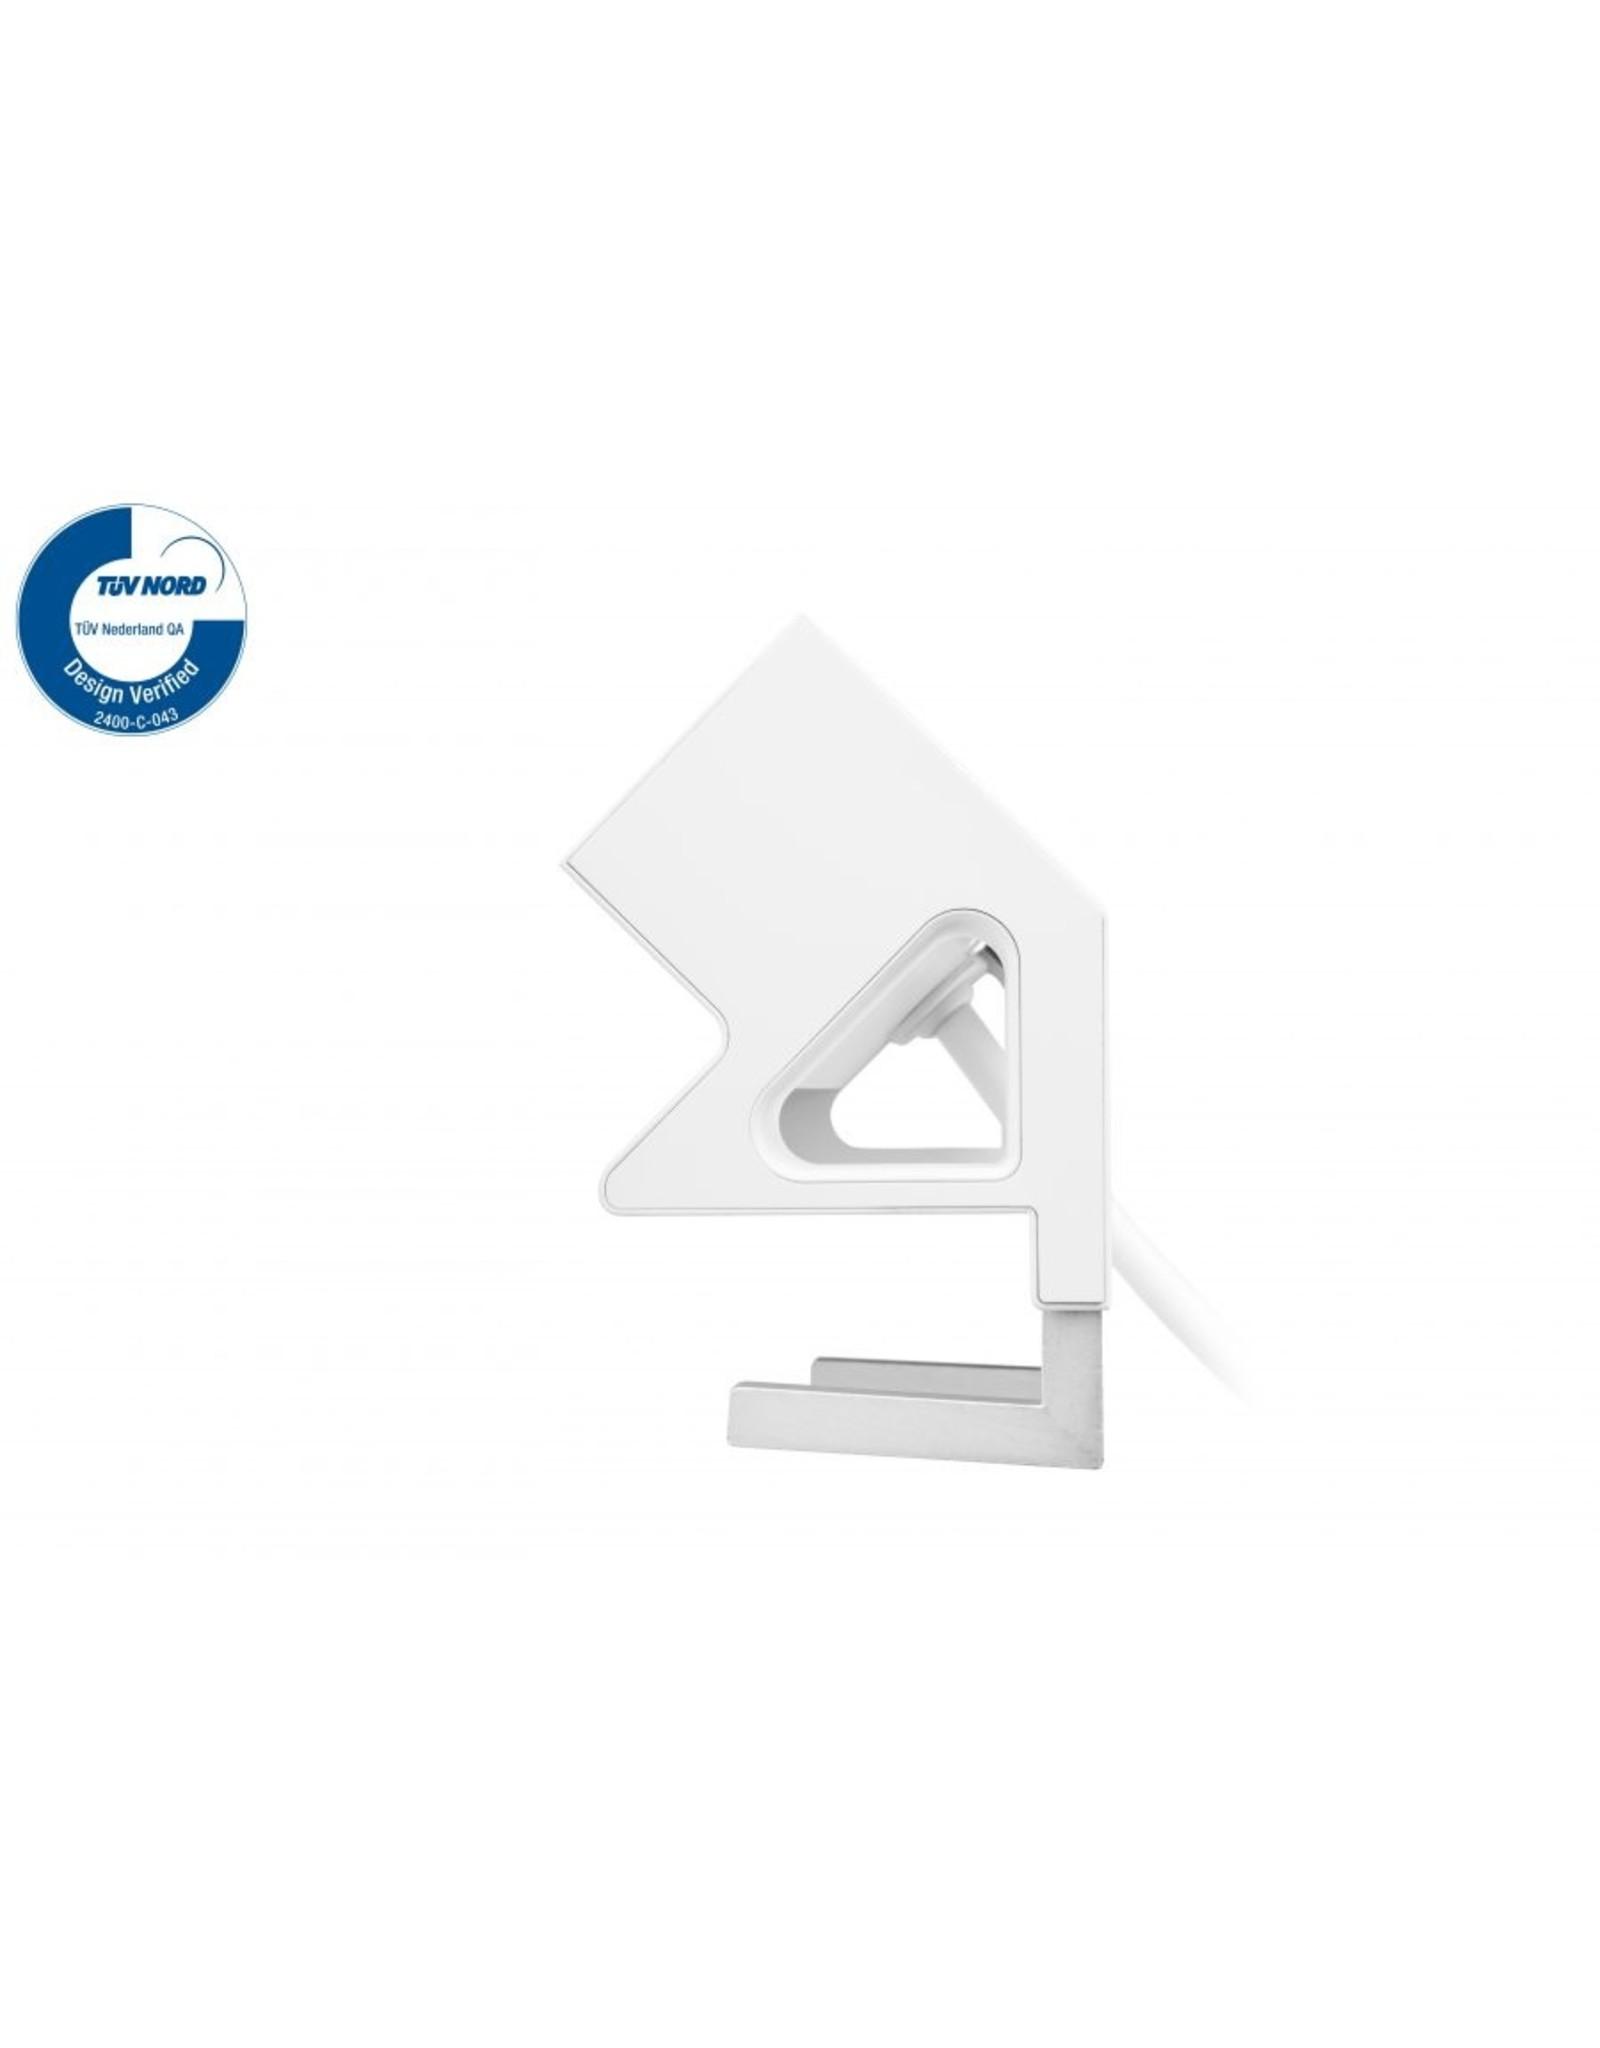 Filex Power Desk up 2.0 - 2x 230V - 2x USB charger